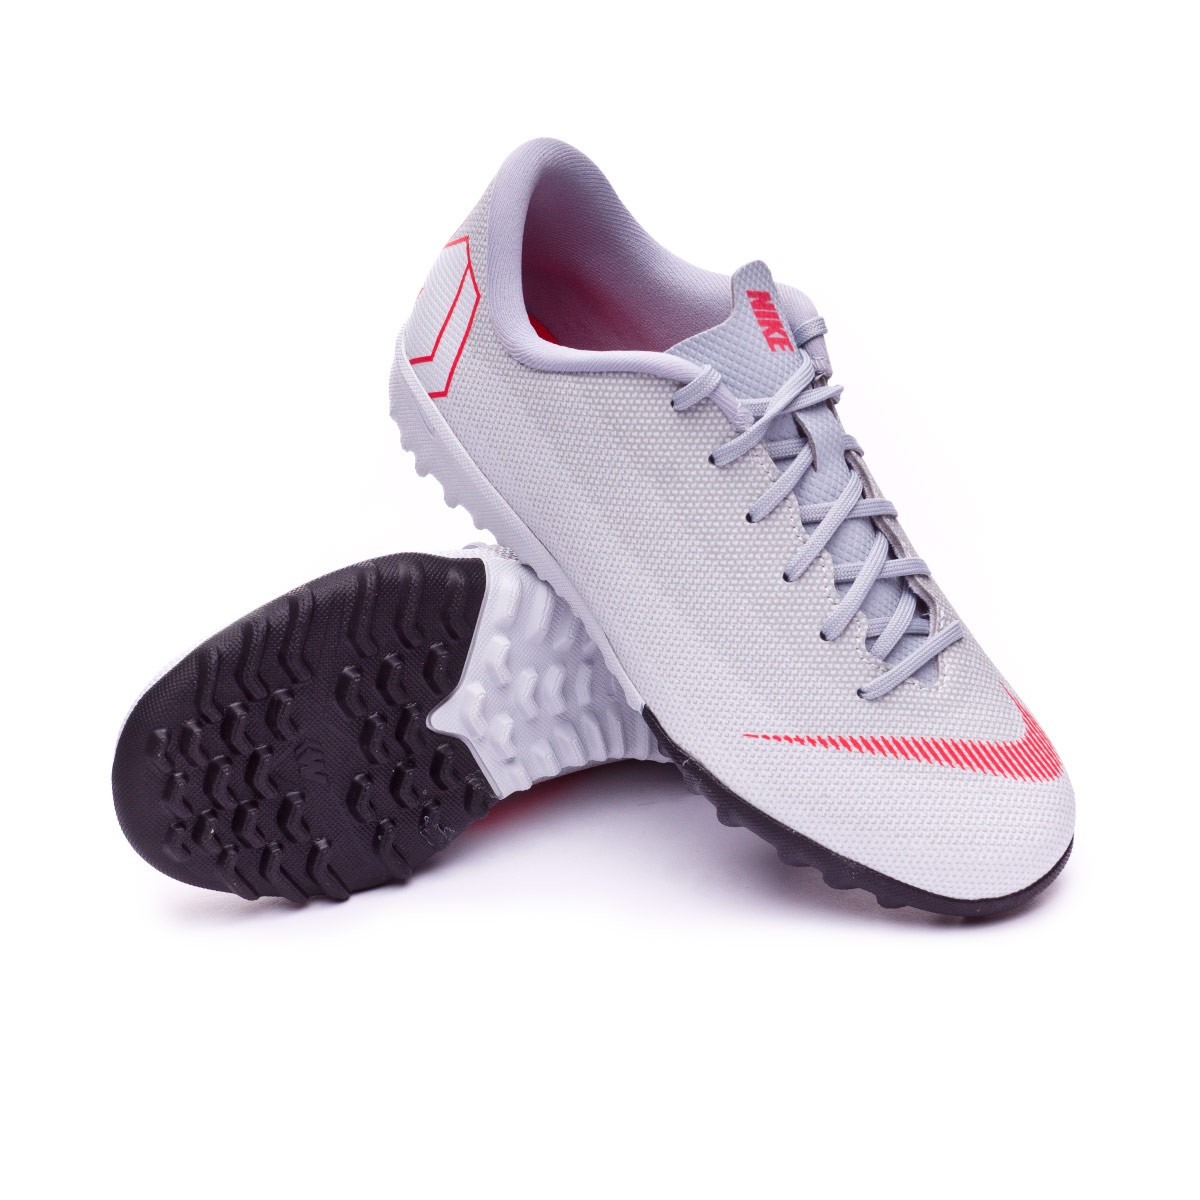 7f38c4e78 Football Boot Nike Kids Mercurial VaporX XII Academy GS Turf Wolf ...